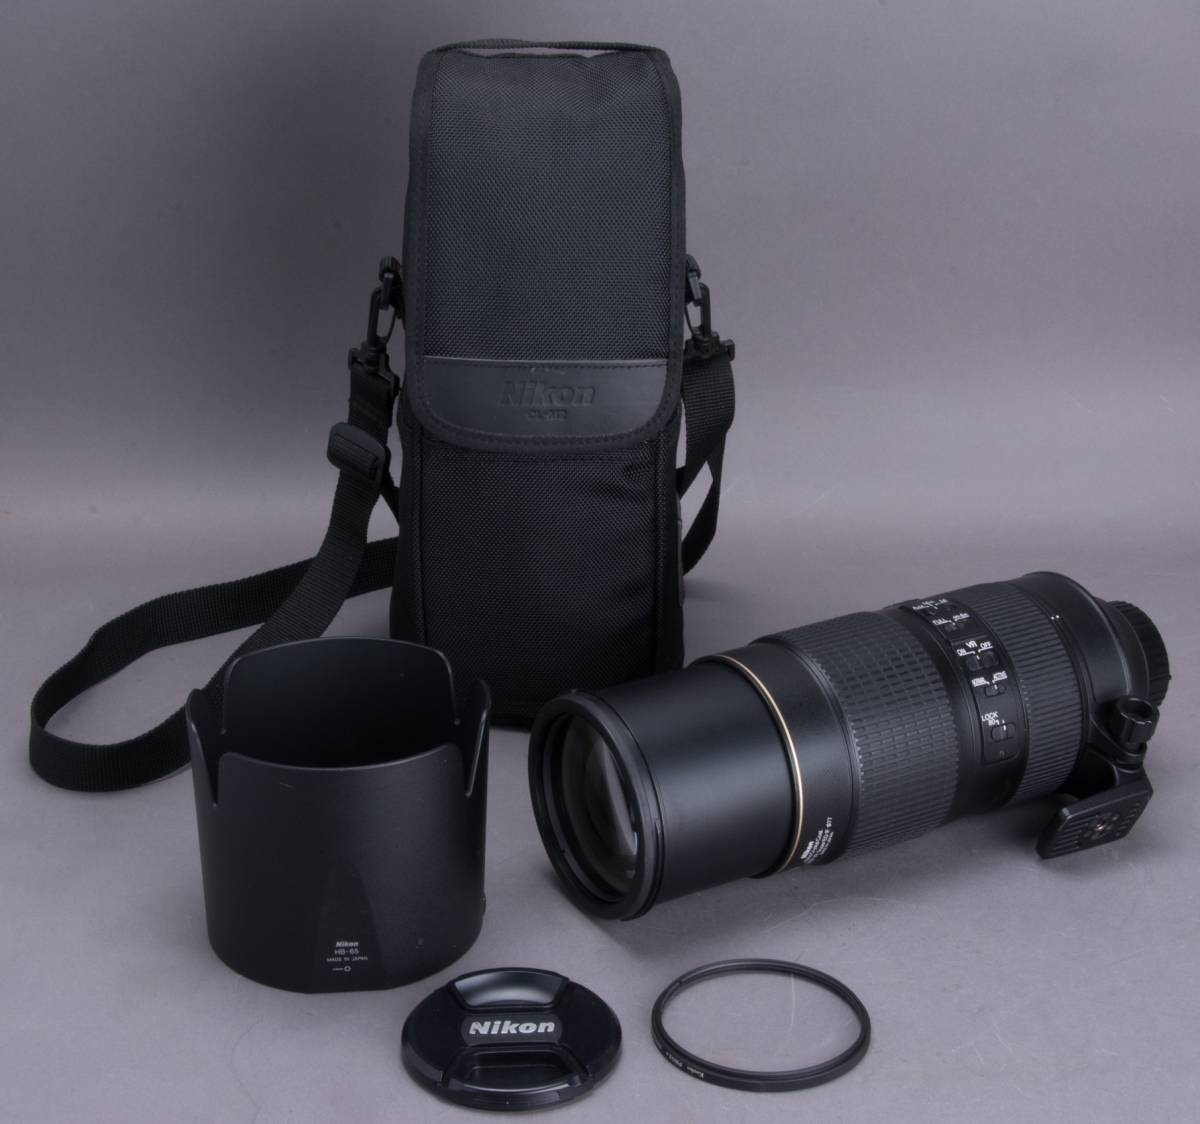 Nikon AF-S NIKKOR 80-400mm f/4.5-5.6G ED VR フード・プロテクター・ケース付 望遠ズームレンズ ニコン 撮影機材 一眼レフ カメラ